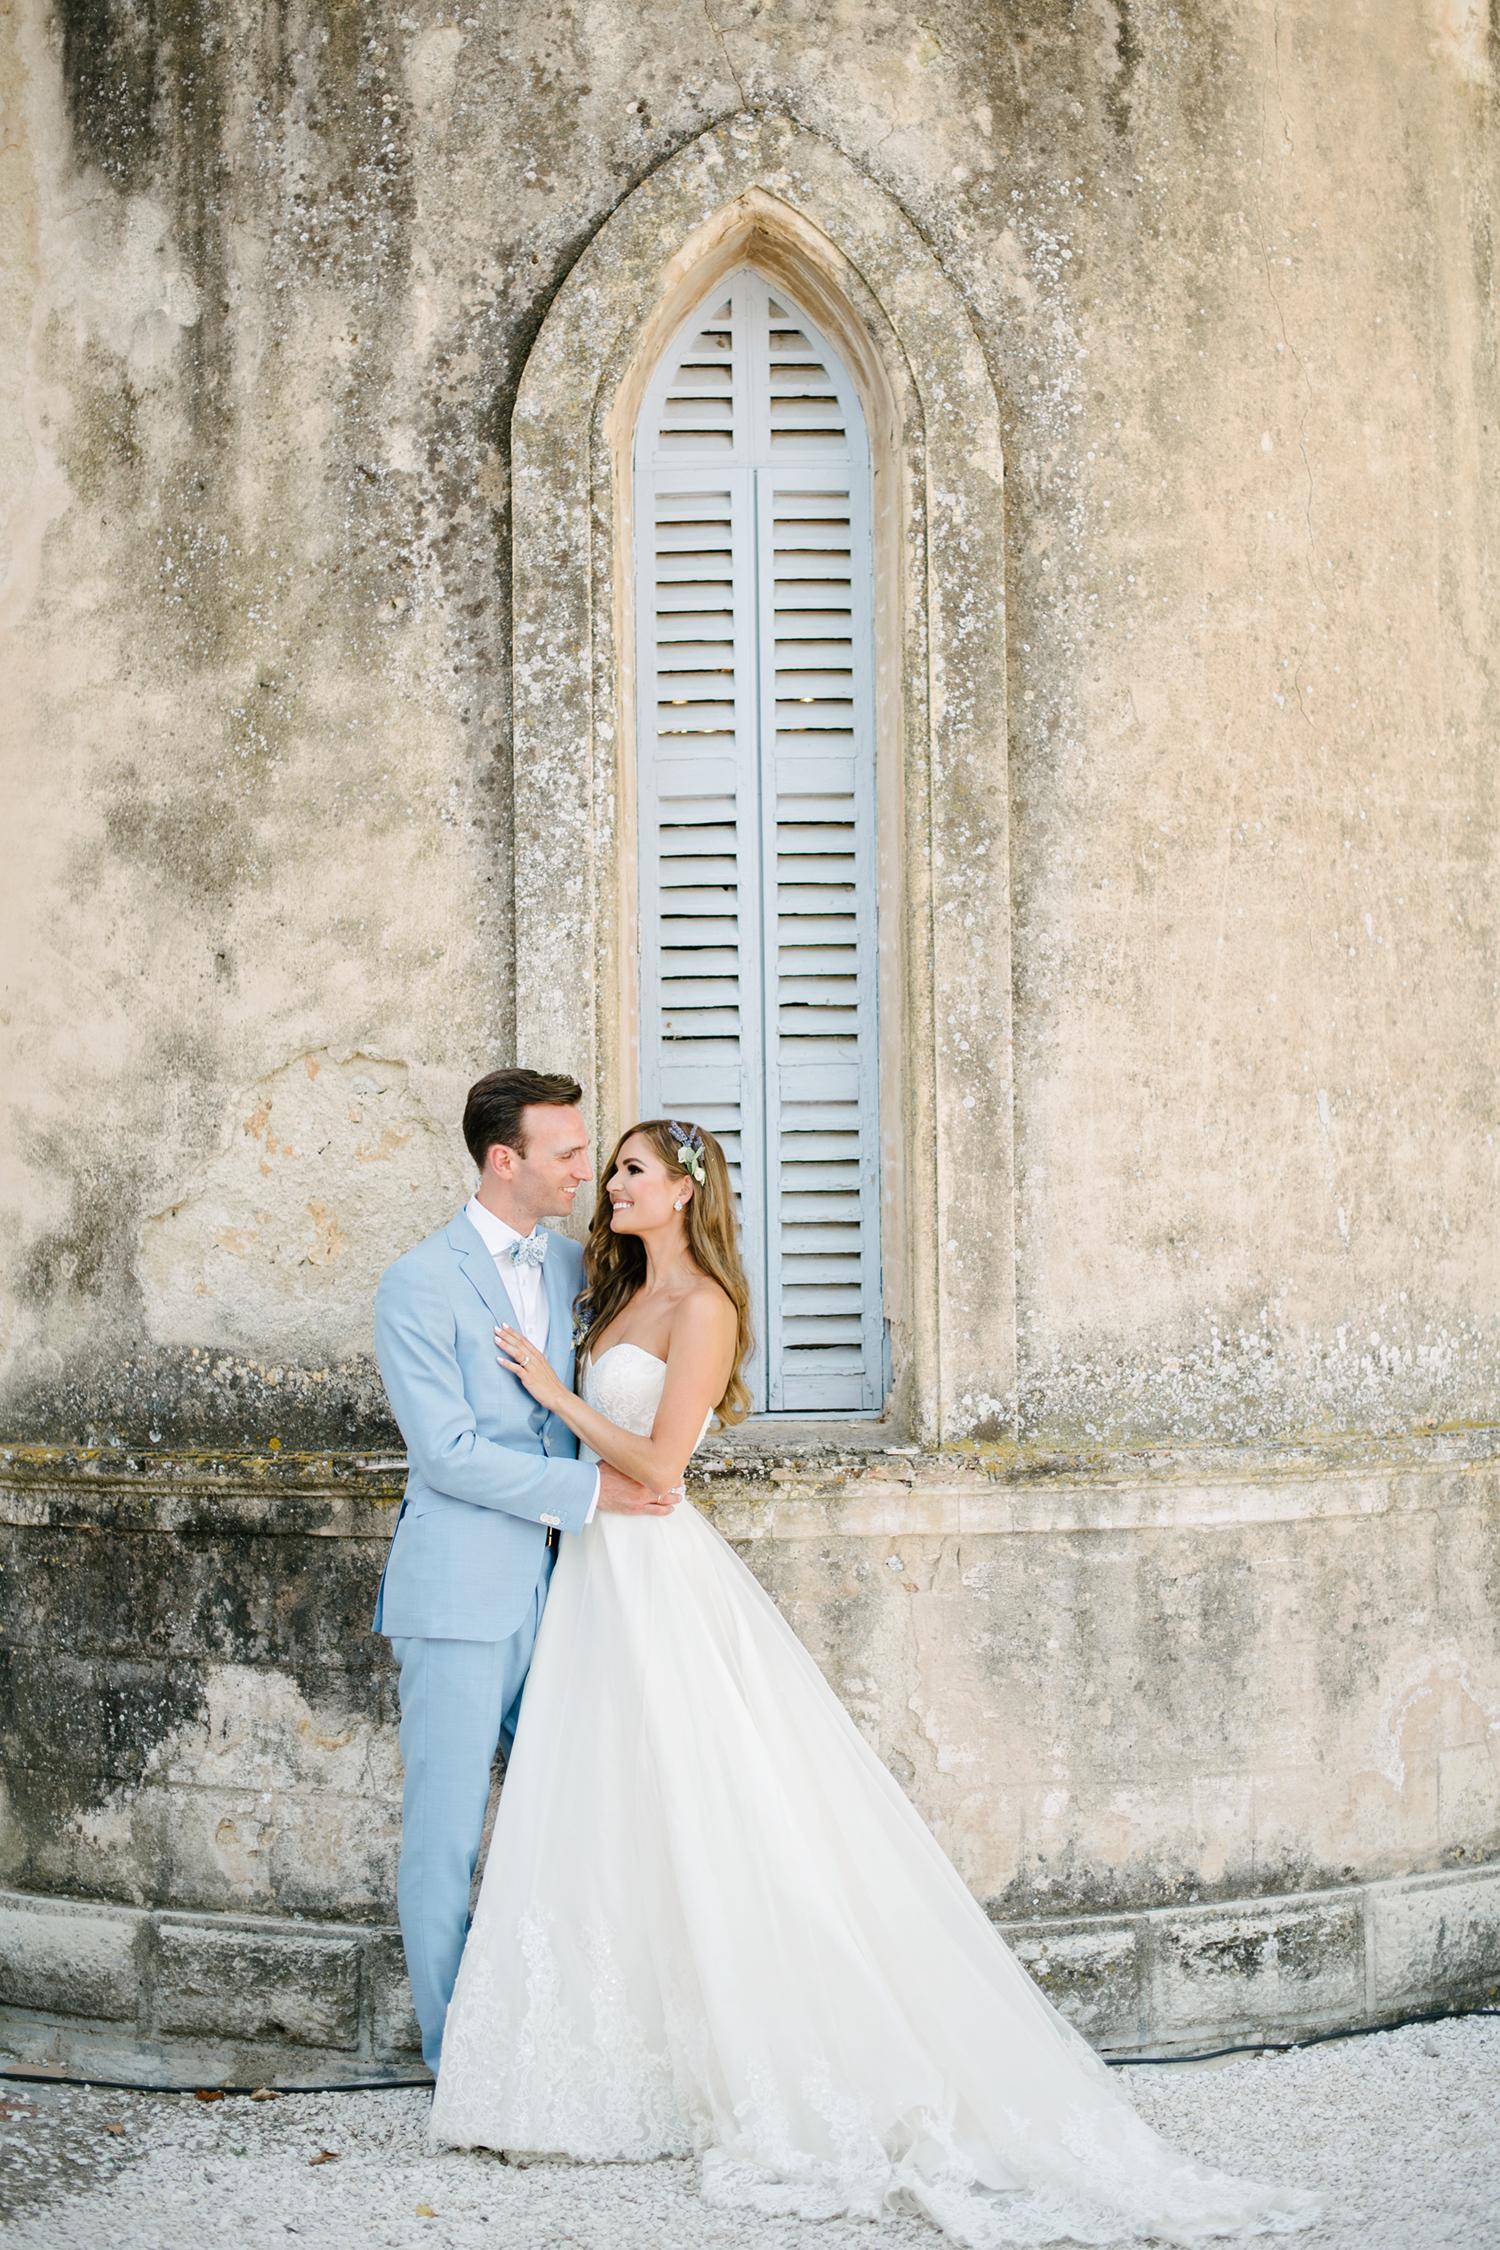 Chateau-Robernier-Wedding-Photographer-0117.jpg